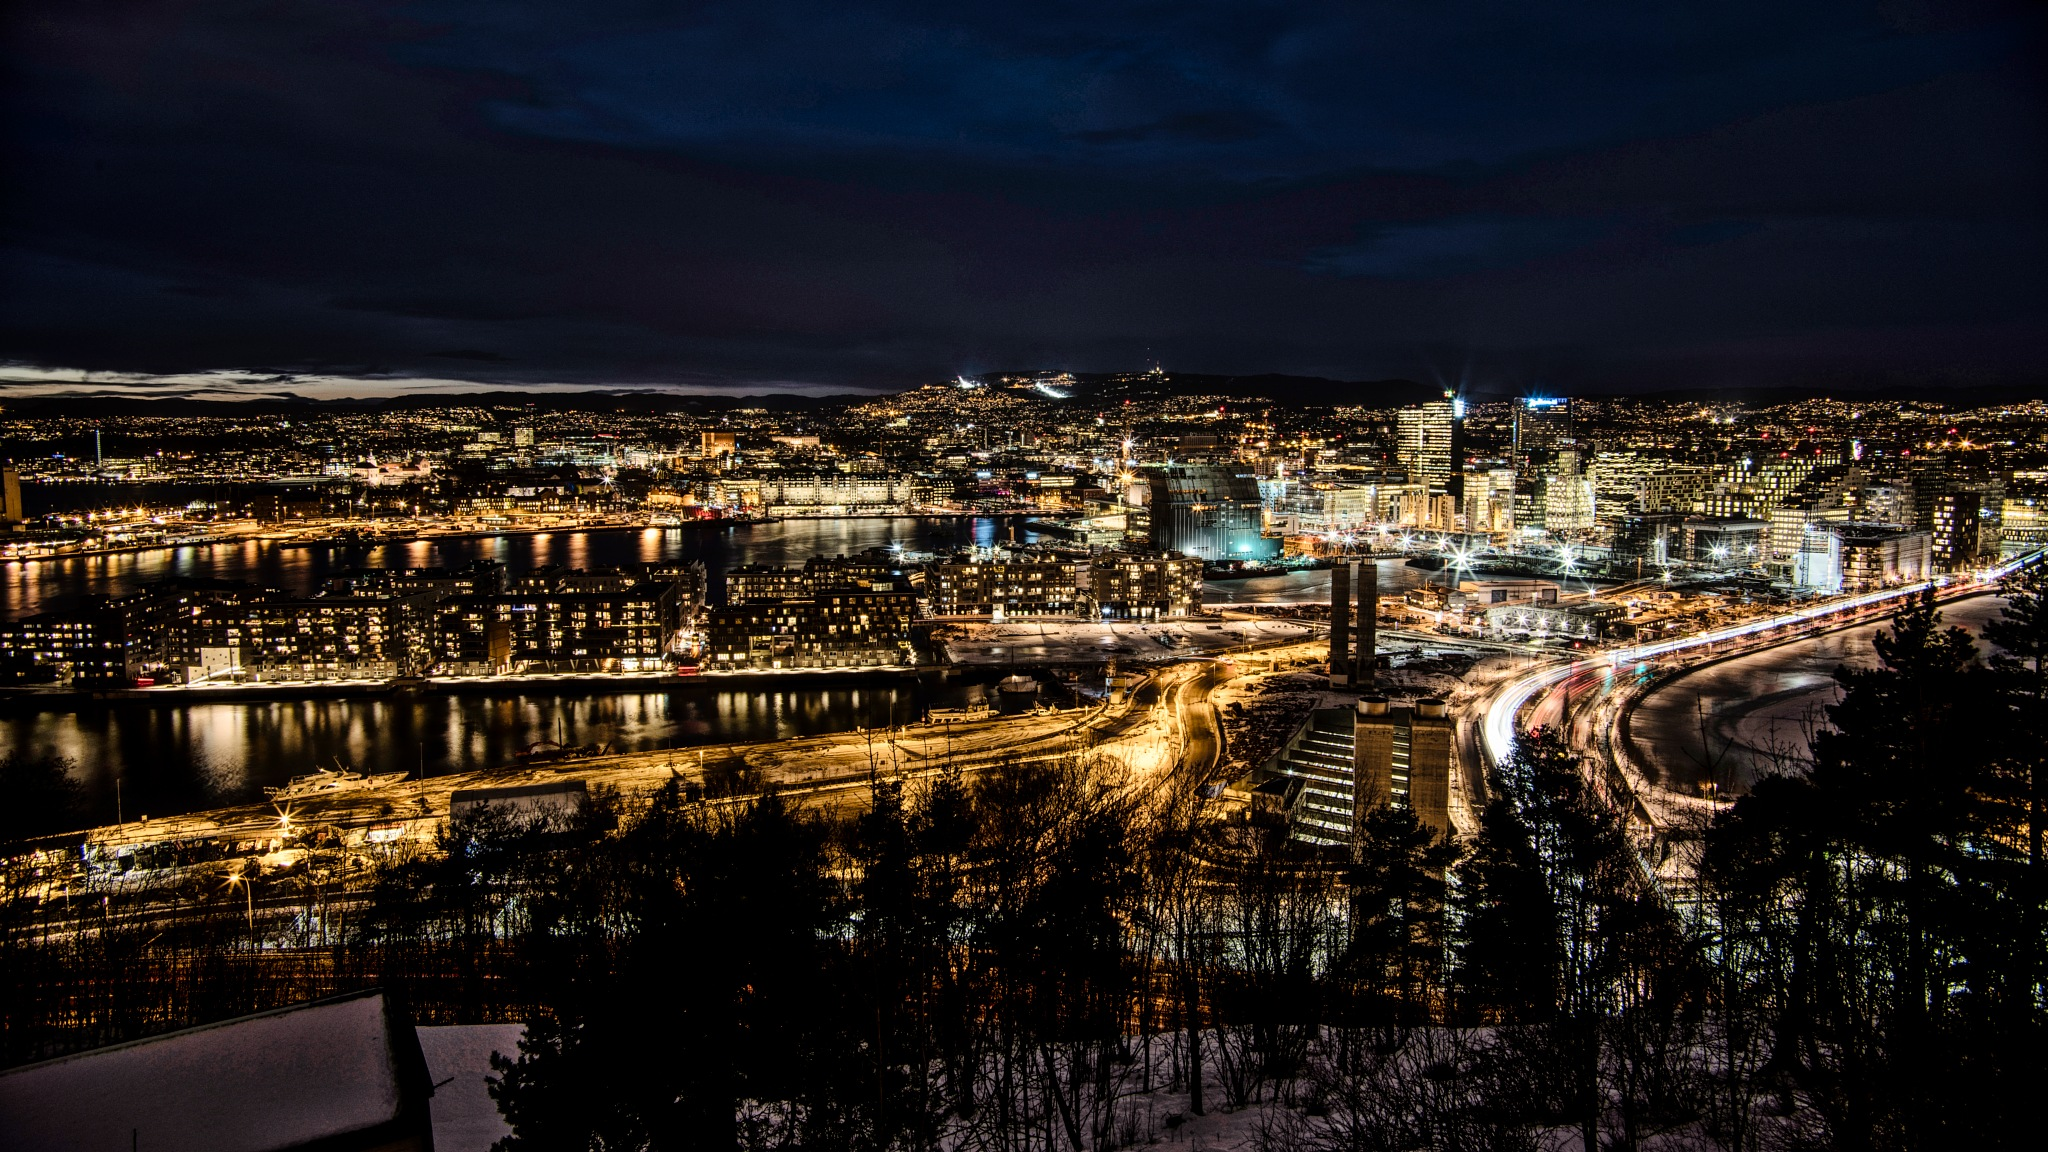 Lights from Northern City - OSLO by night  by Goran Jorganovich